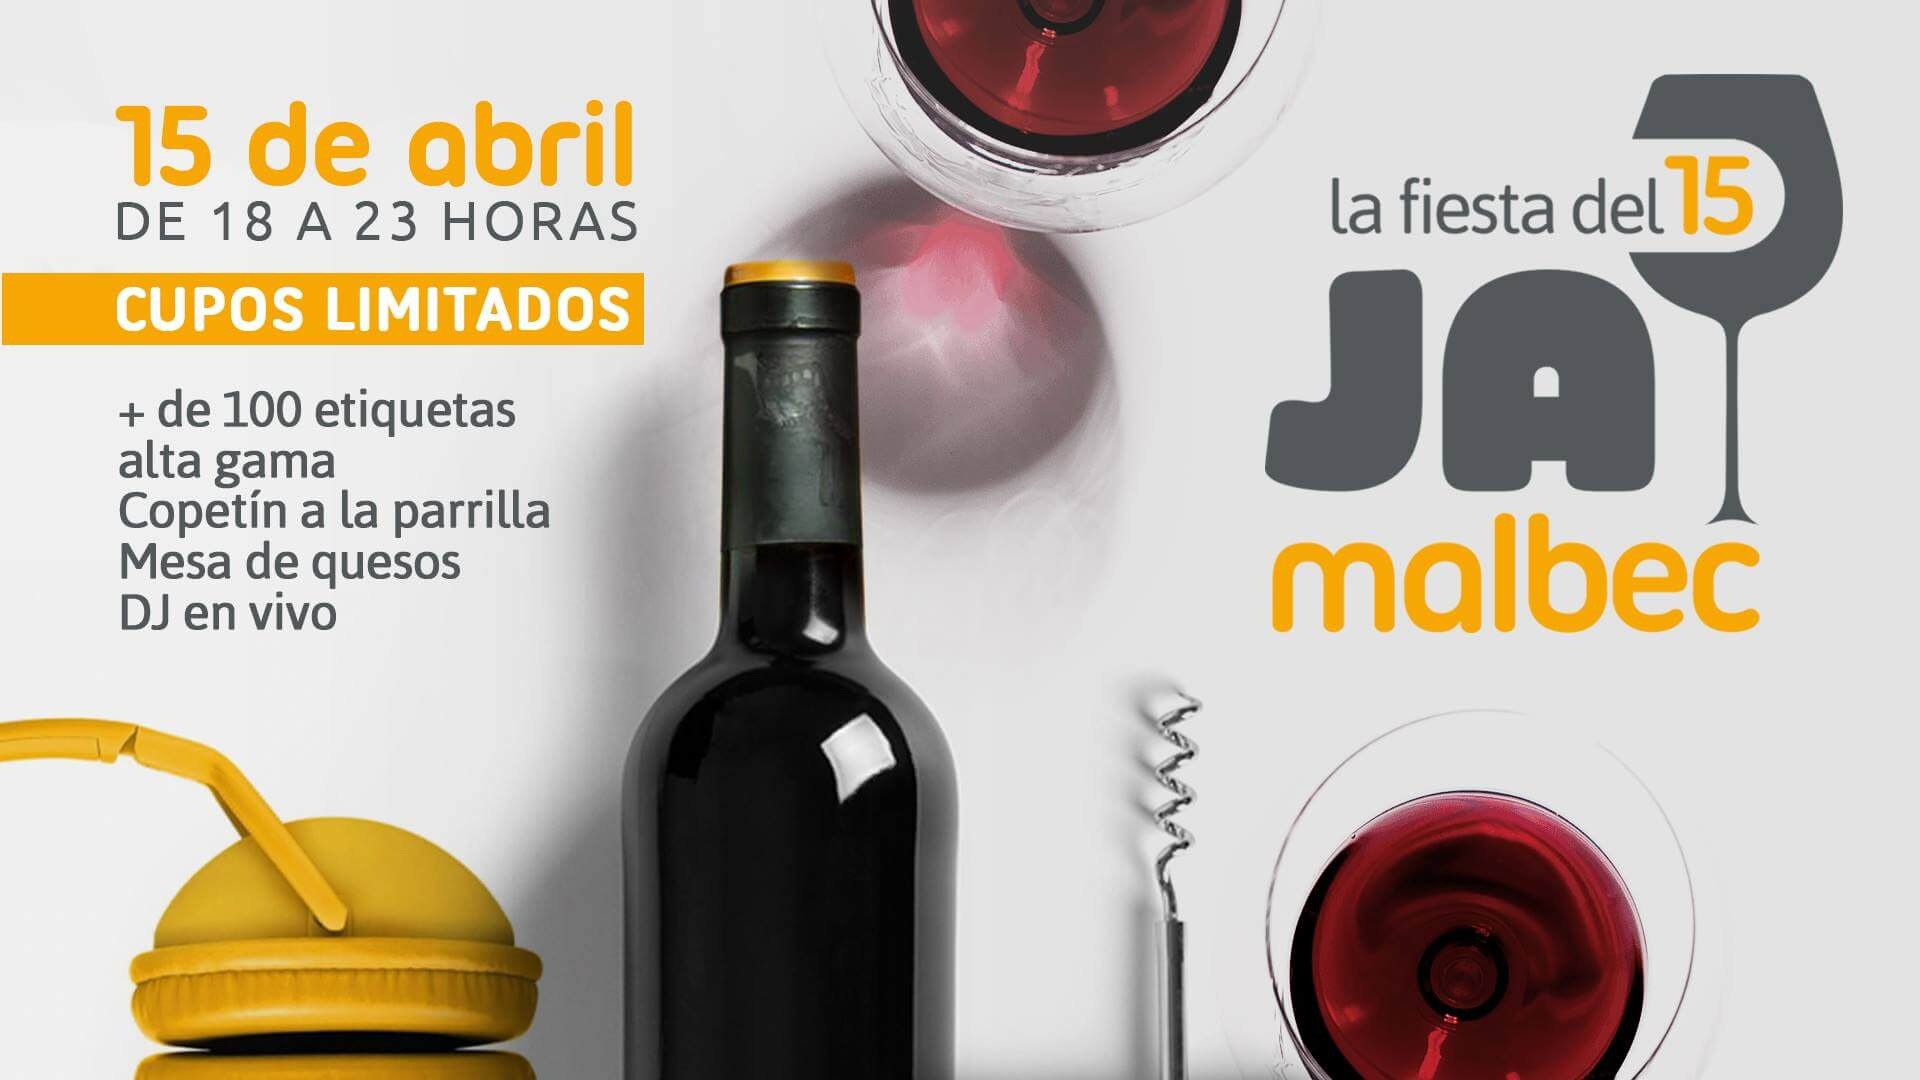 Celebrating Malbec World Day in Buenos Aires at Ja! Lo de Joaquin Alberdi Wines